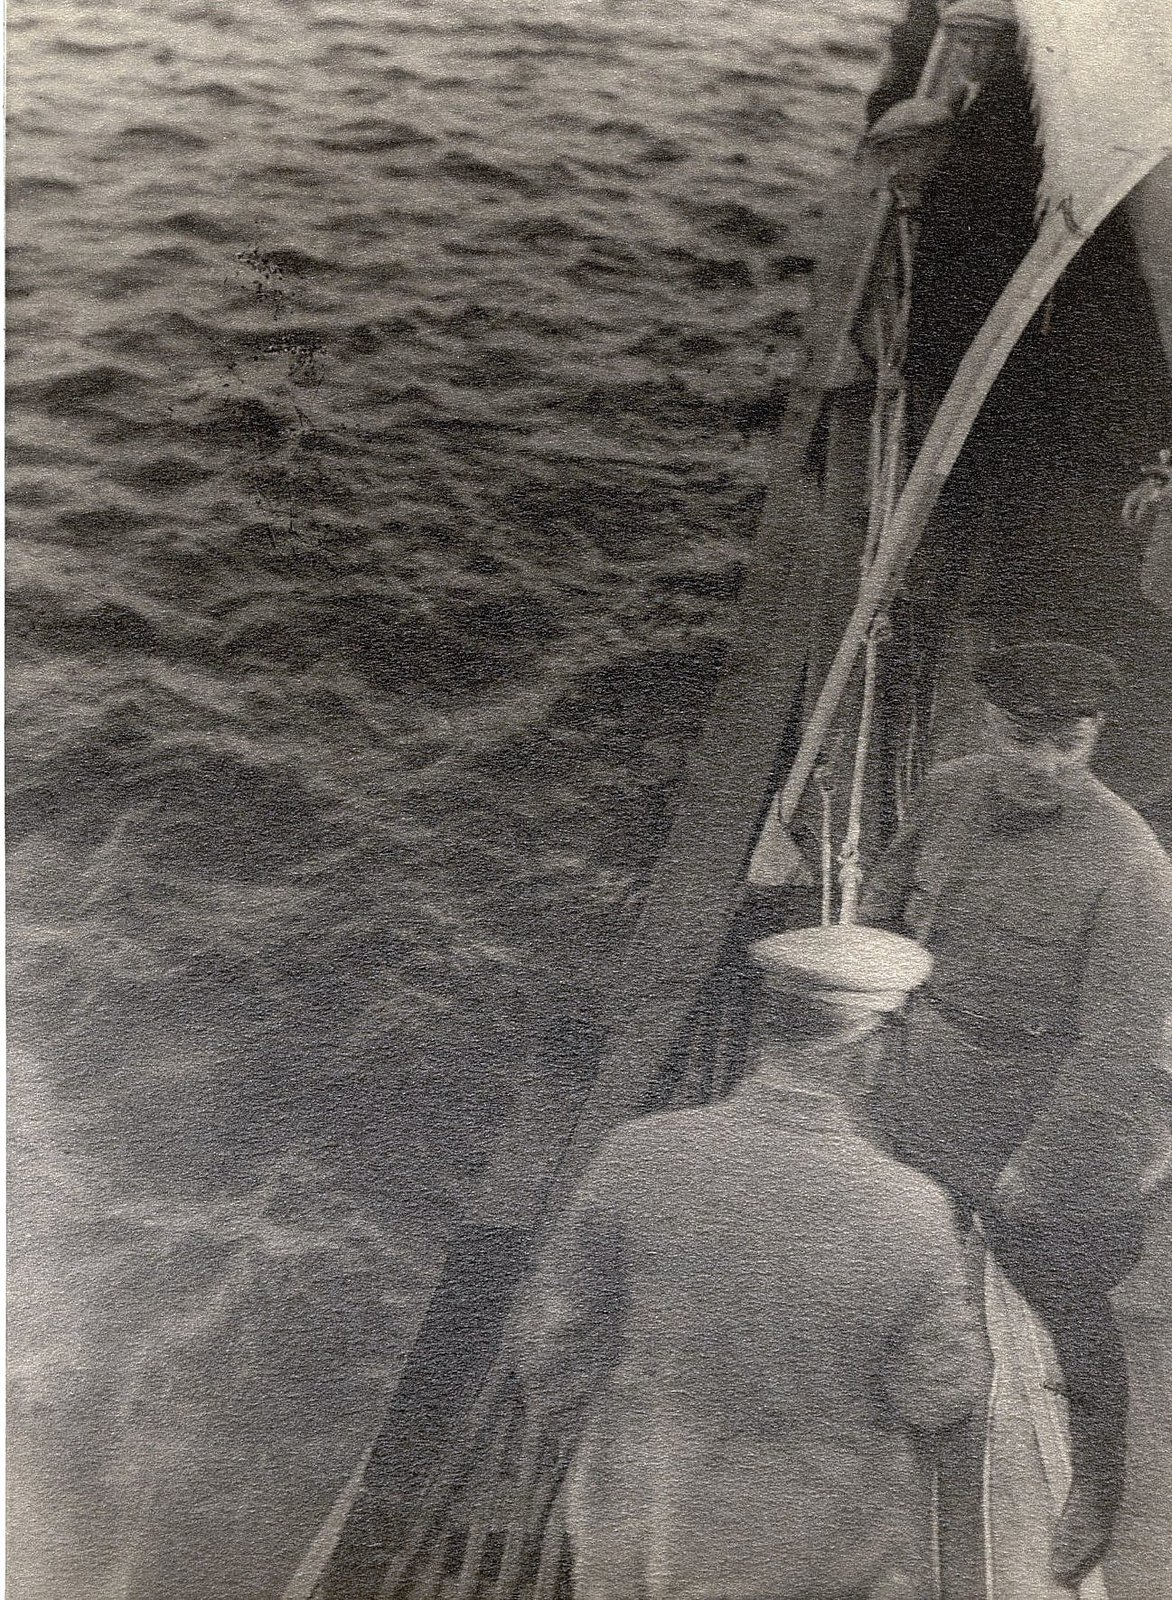 48.  И.В. Сталин, К.Е. Ворошилов на теплоходе Клара Цеткин. На корме. Август 1933